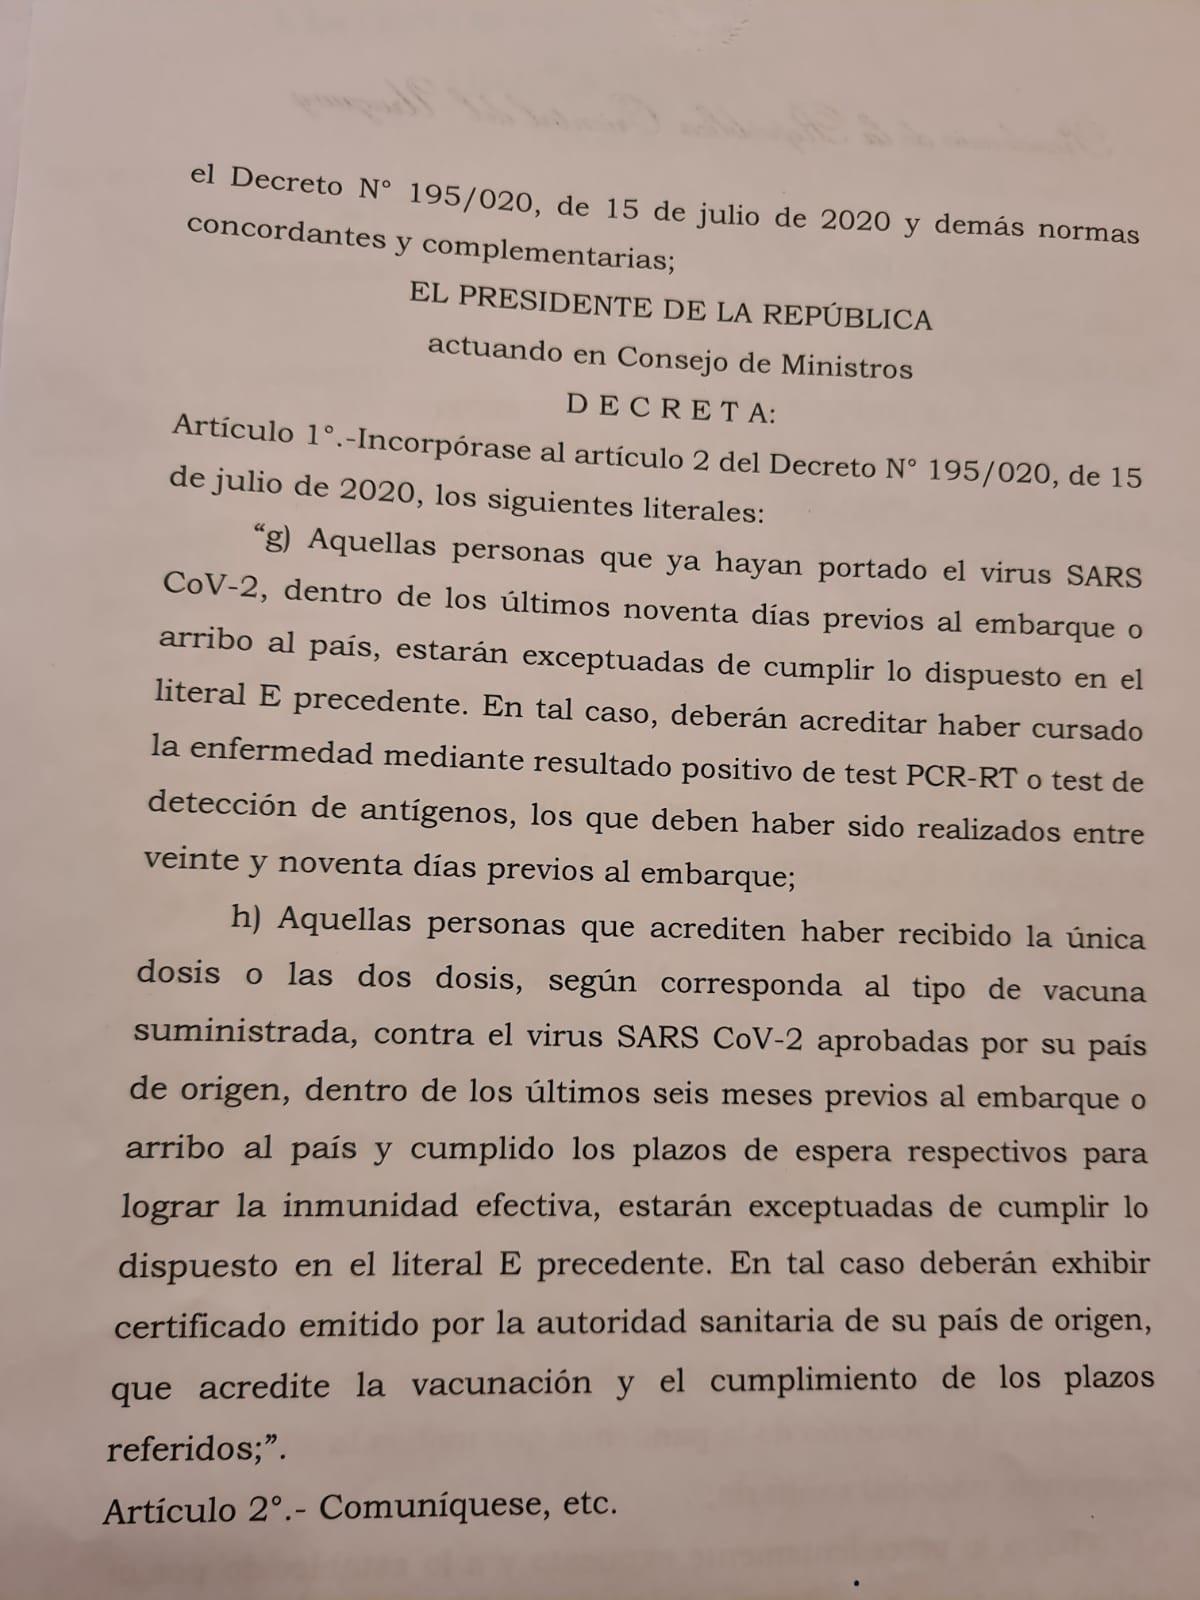 Decreto del Poder Ejecutivo aprobado este miércoles.